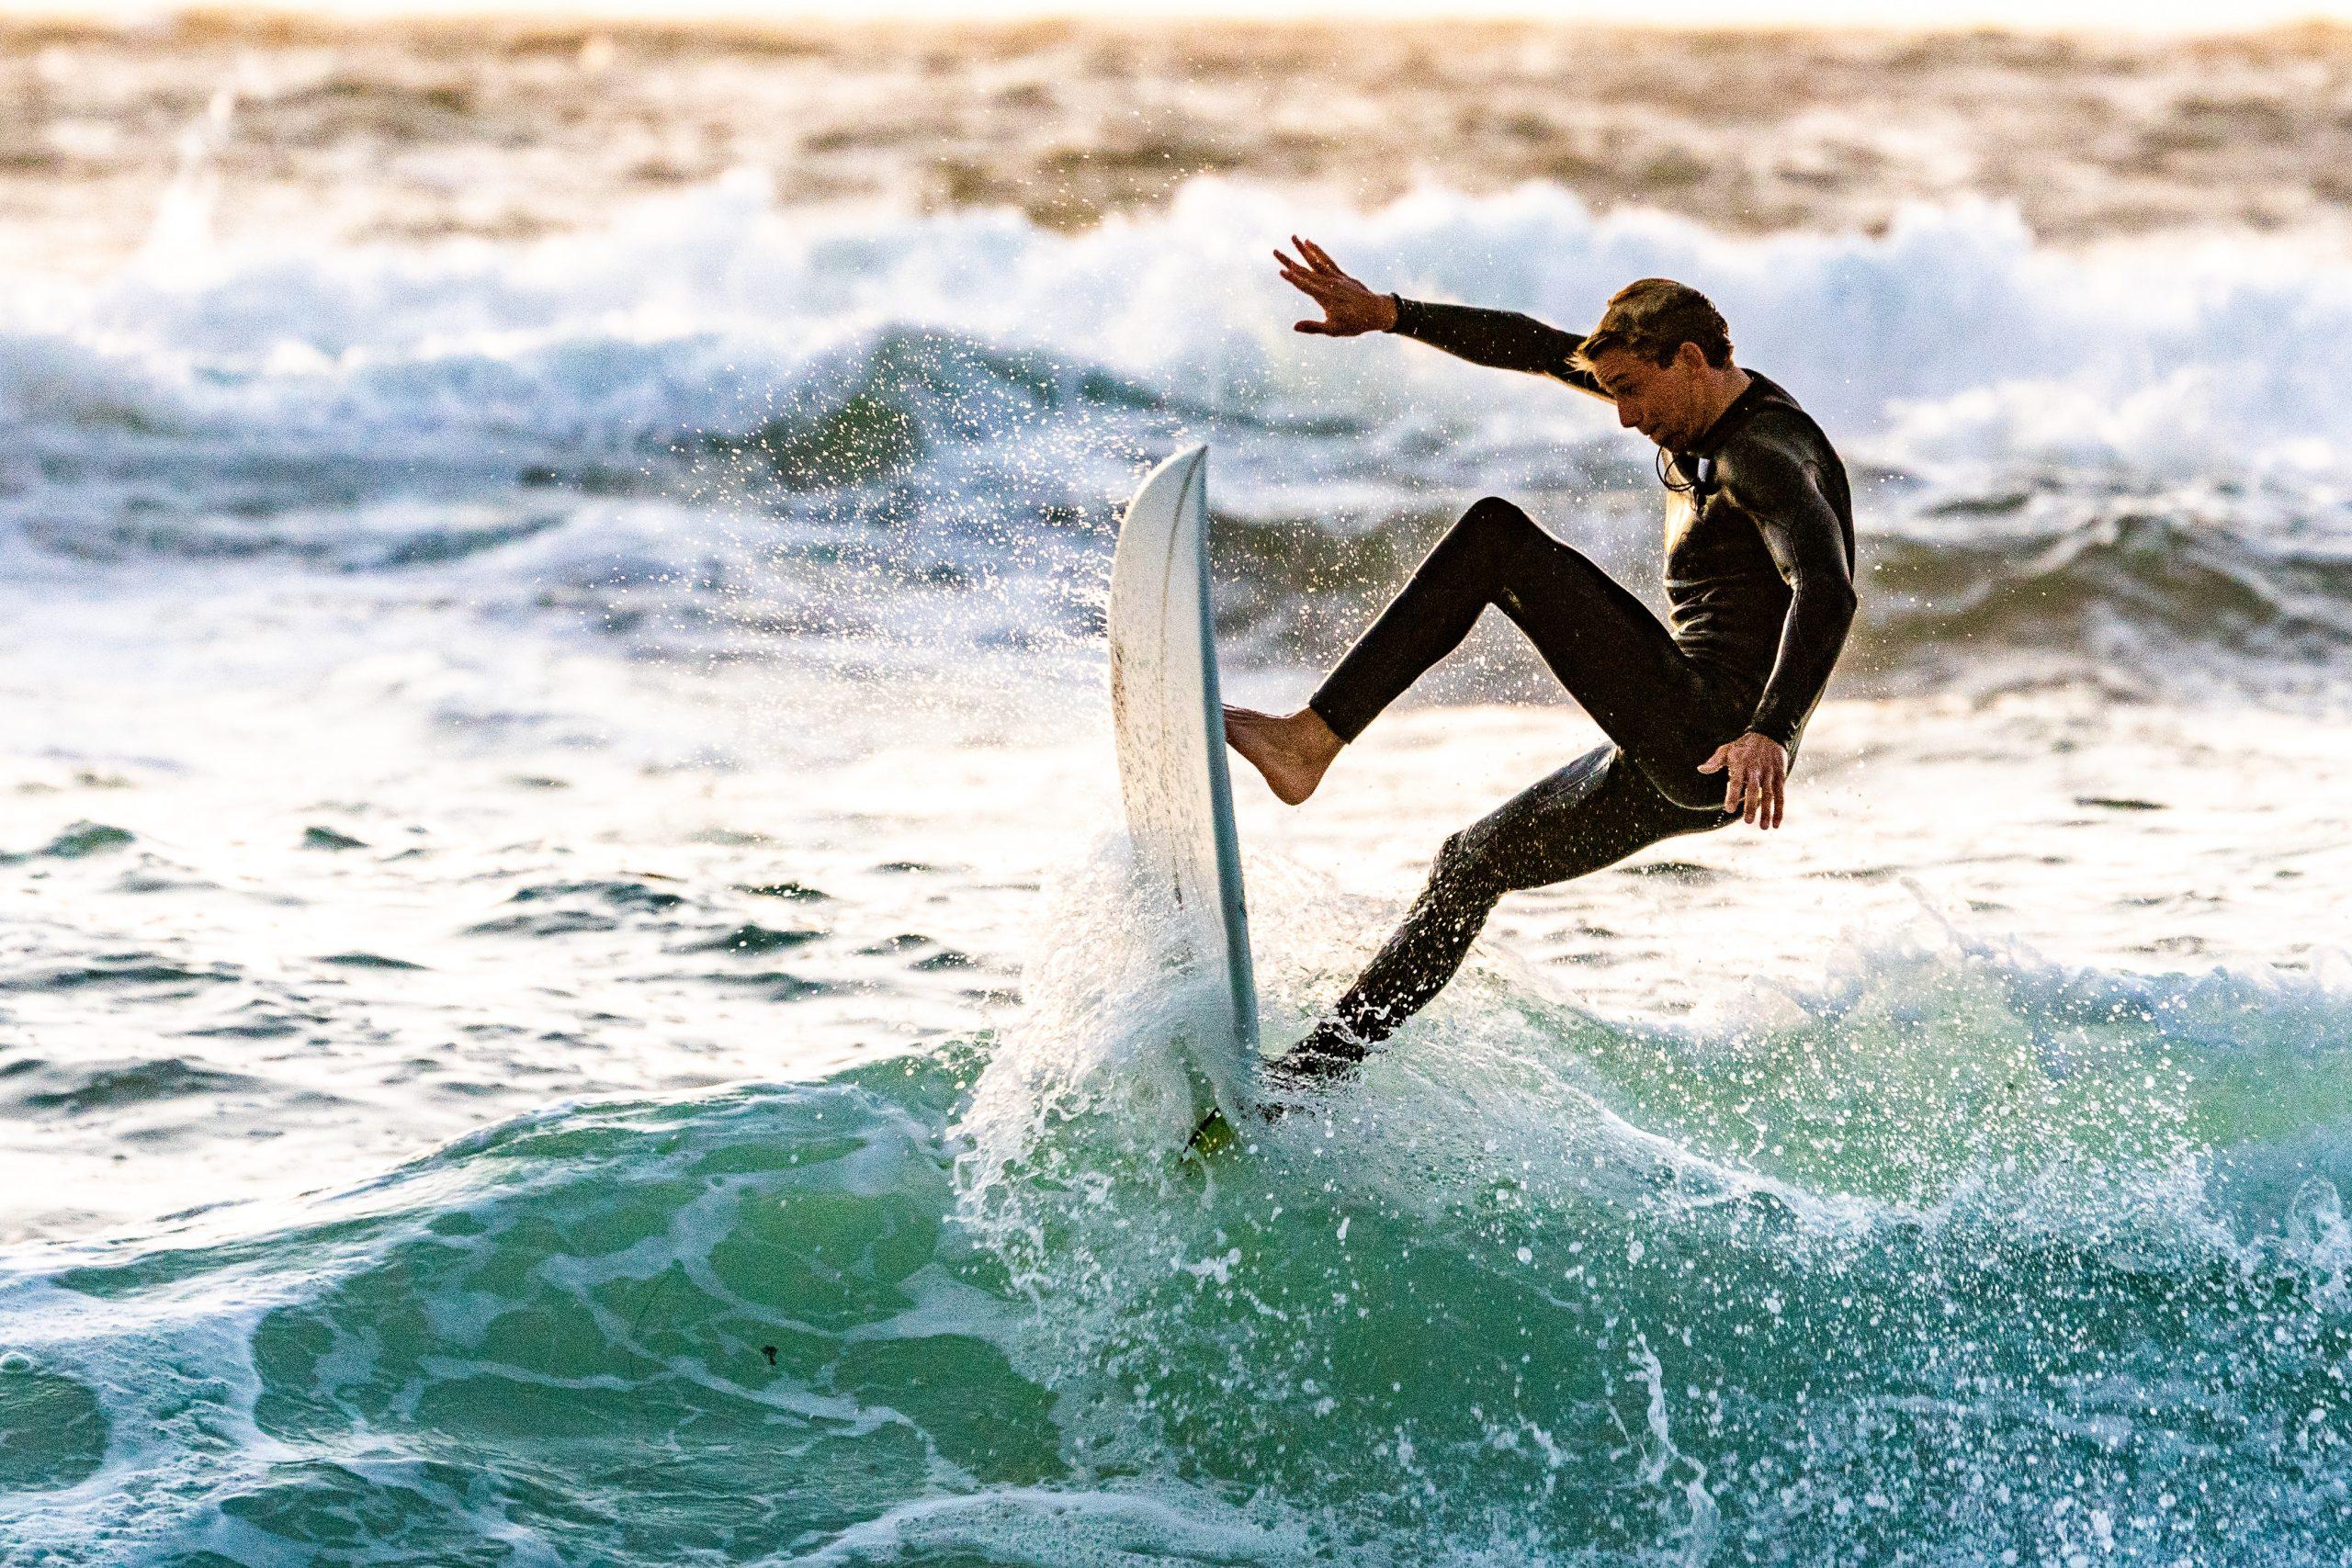 Turismo Esportivo na Costa Rica para surfar